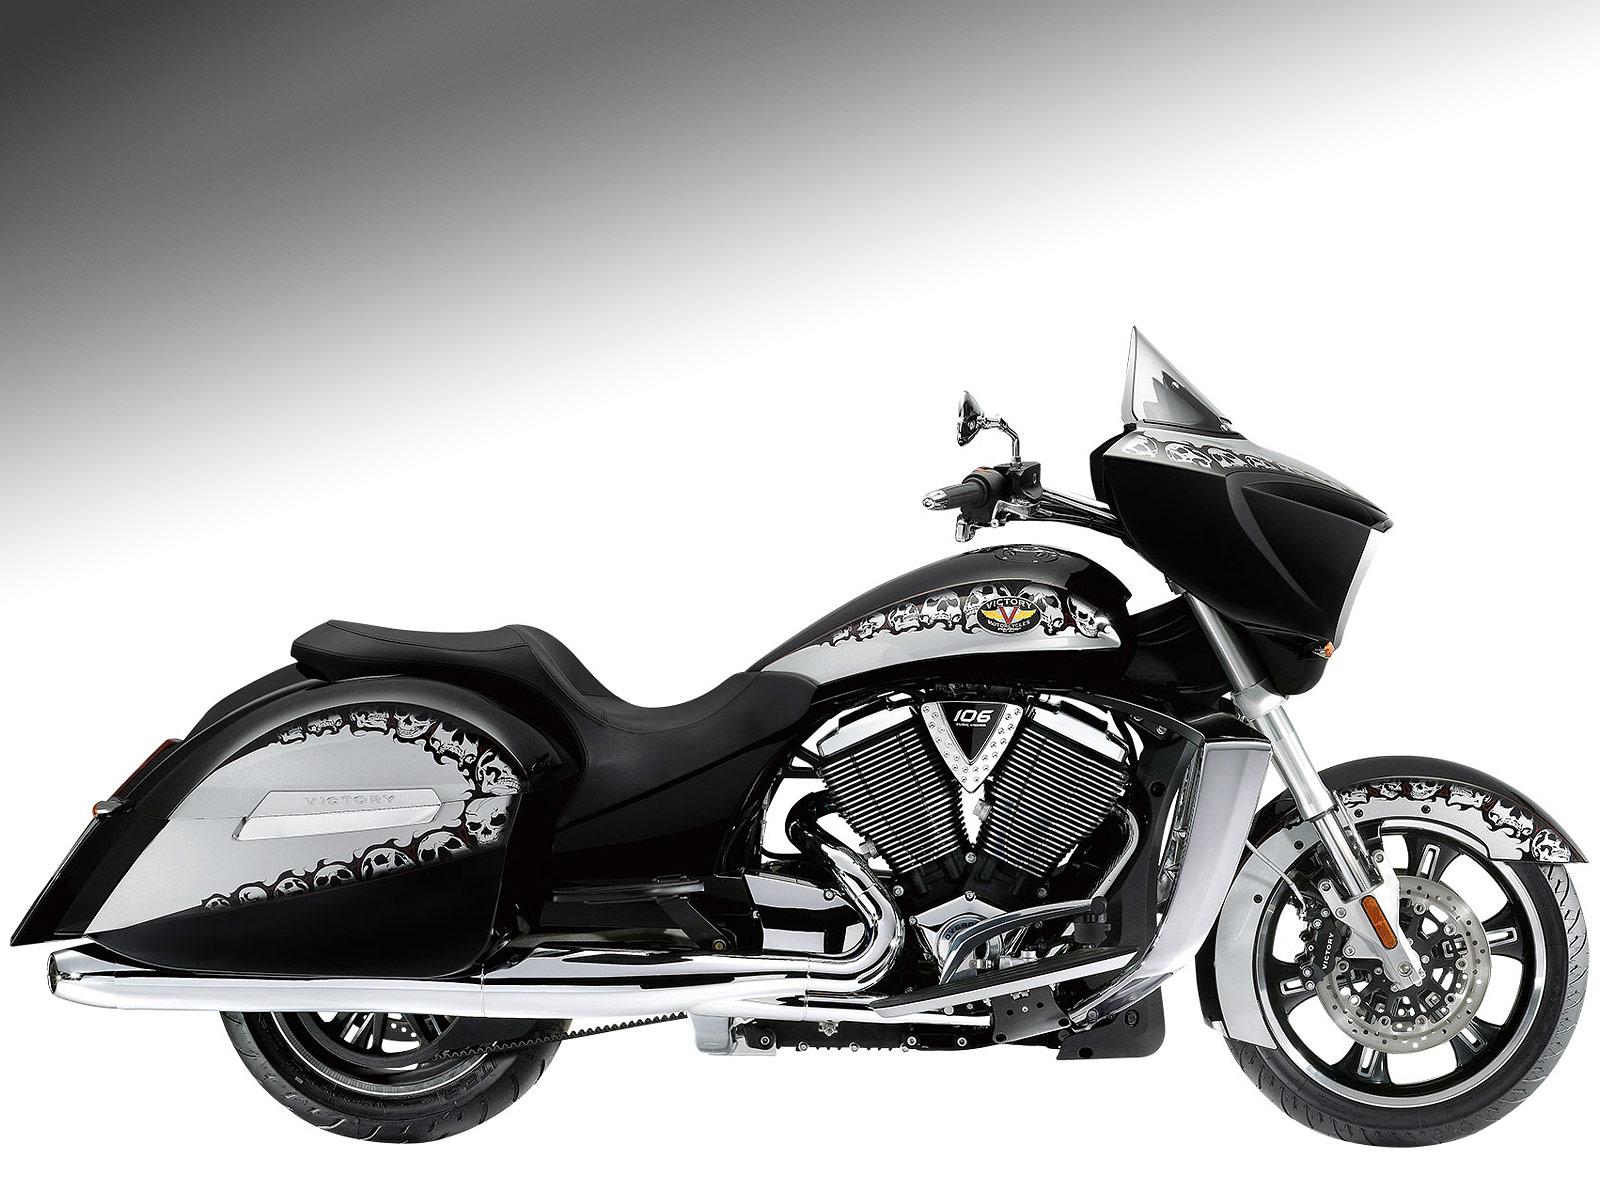 2010 VICTORY Cross Country Motorcycle Desktop Wallpaper 1600x1200